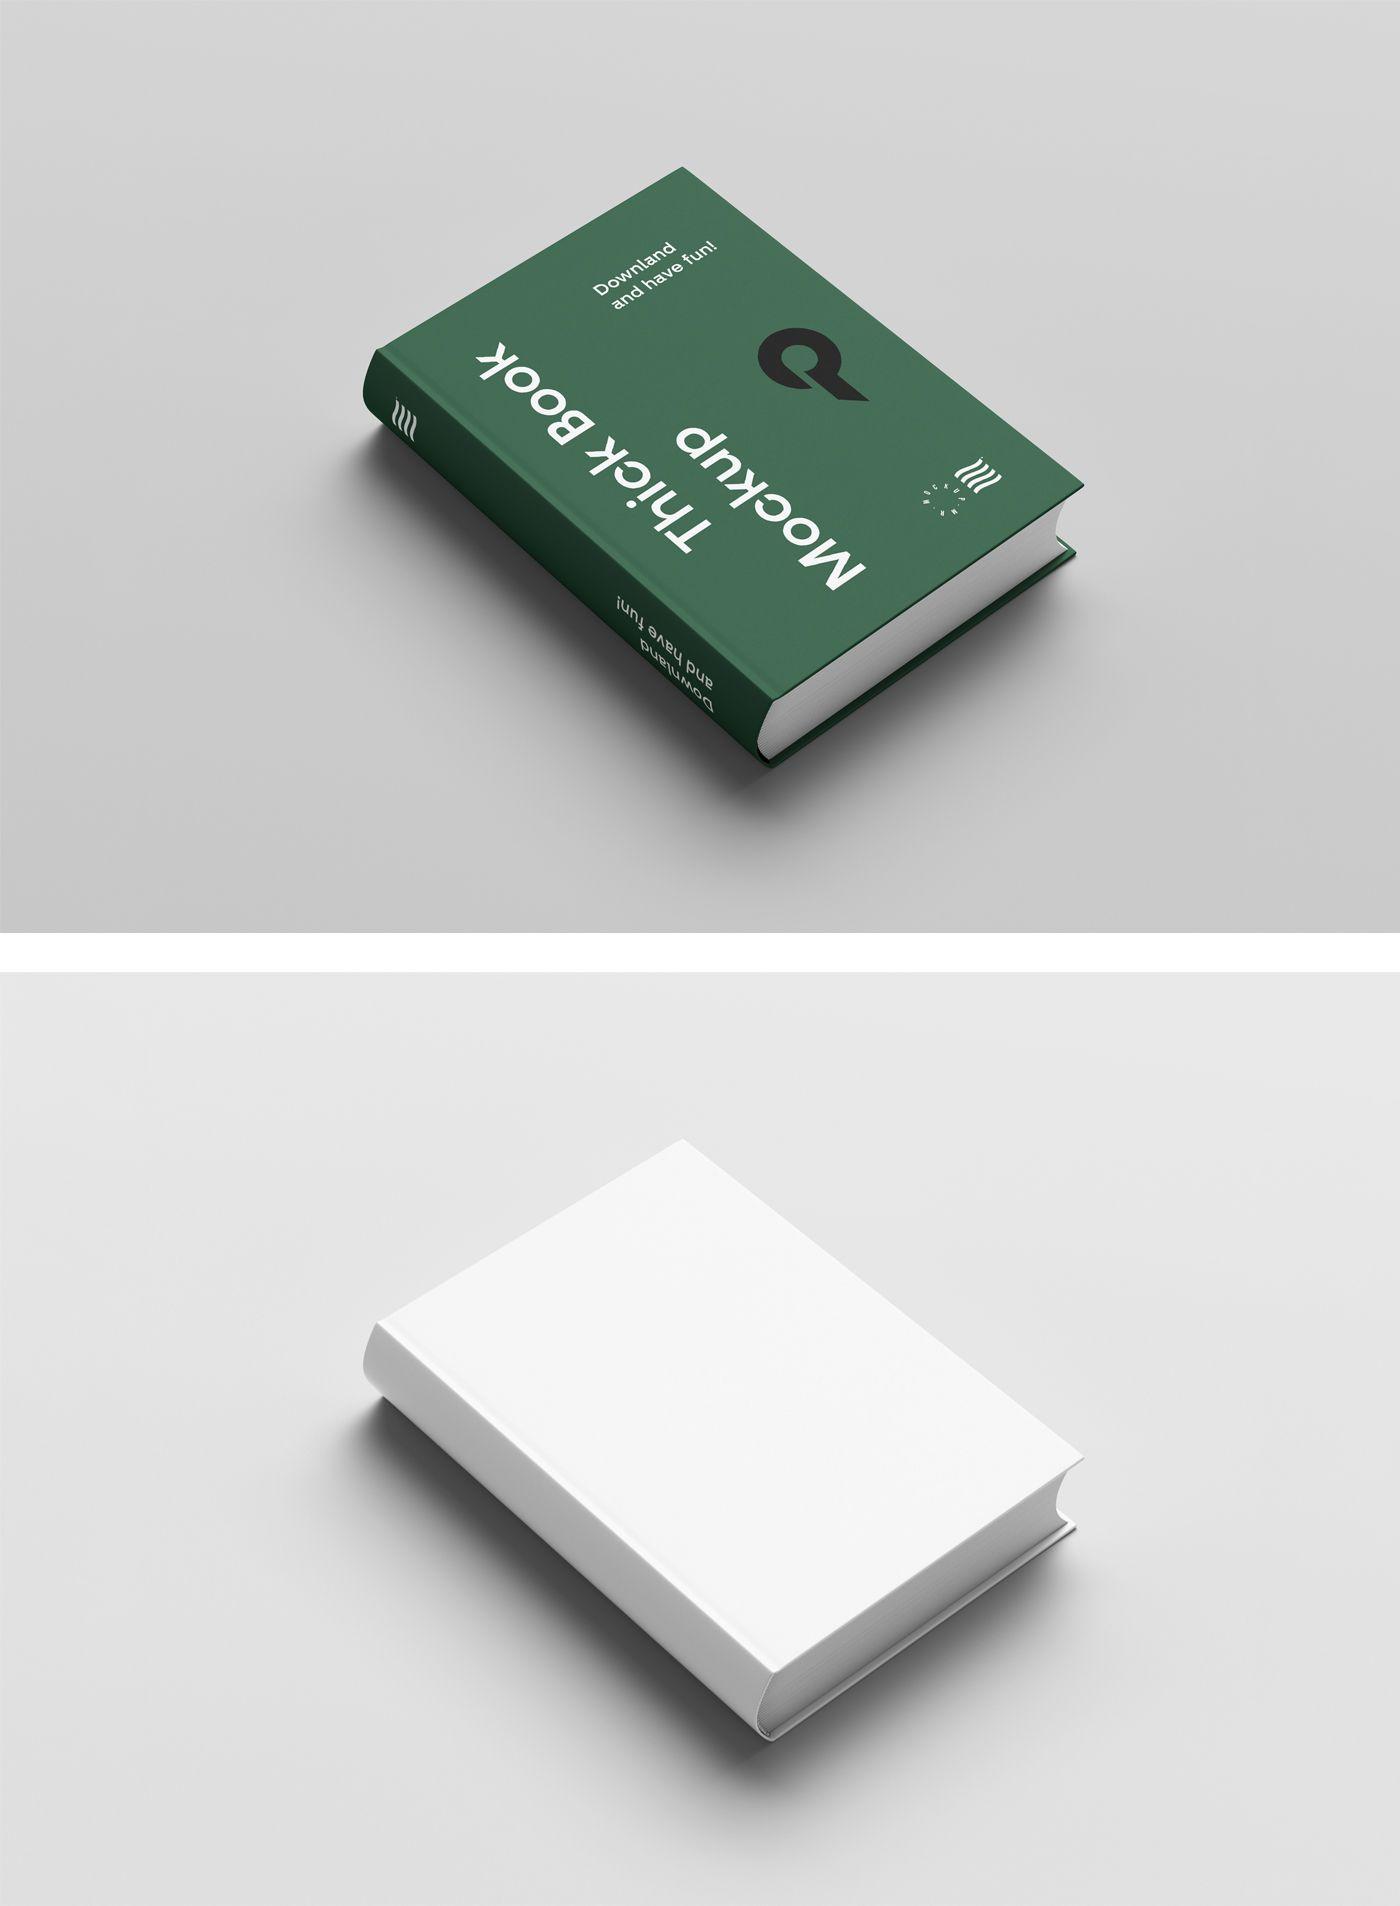 Hard Cover Book Mockup Mr Mockup Graphic Design Freebies Graphic Design Freebies Design Freebie Book Cover